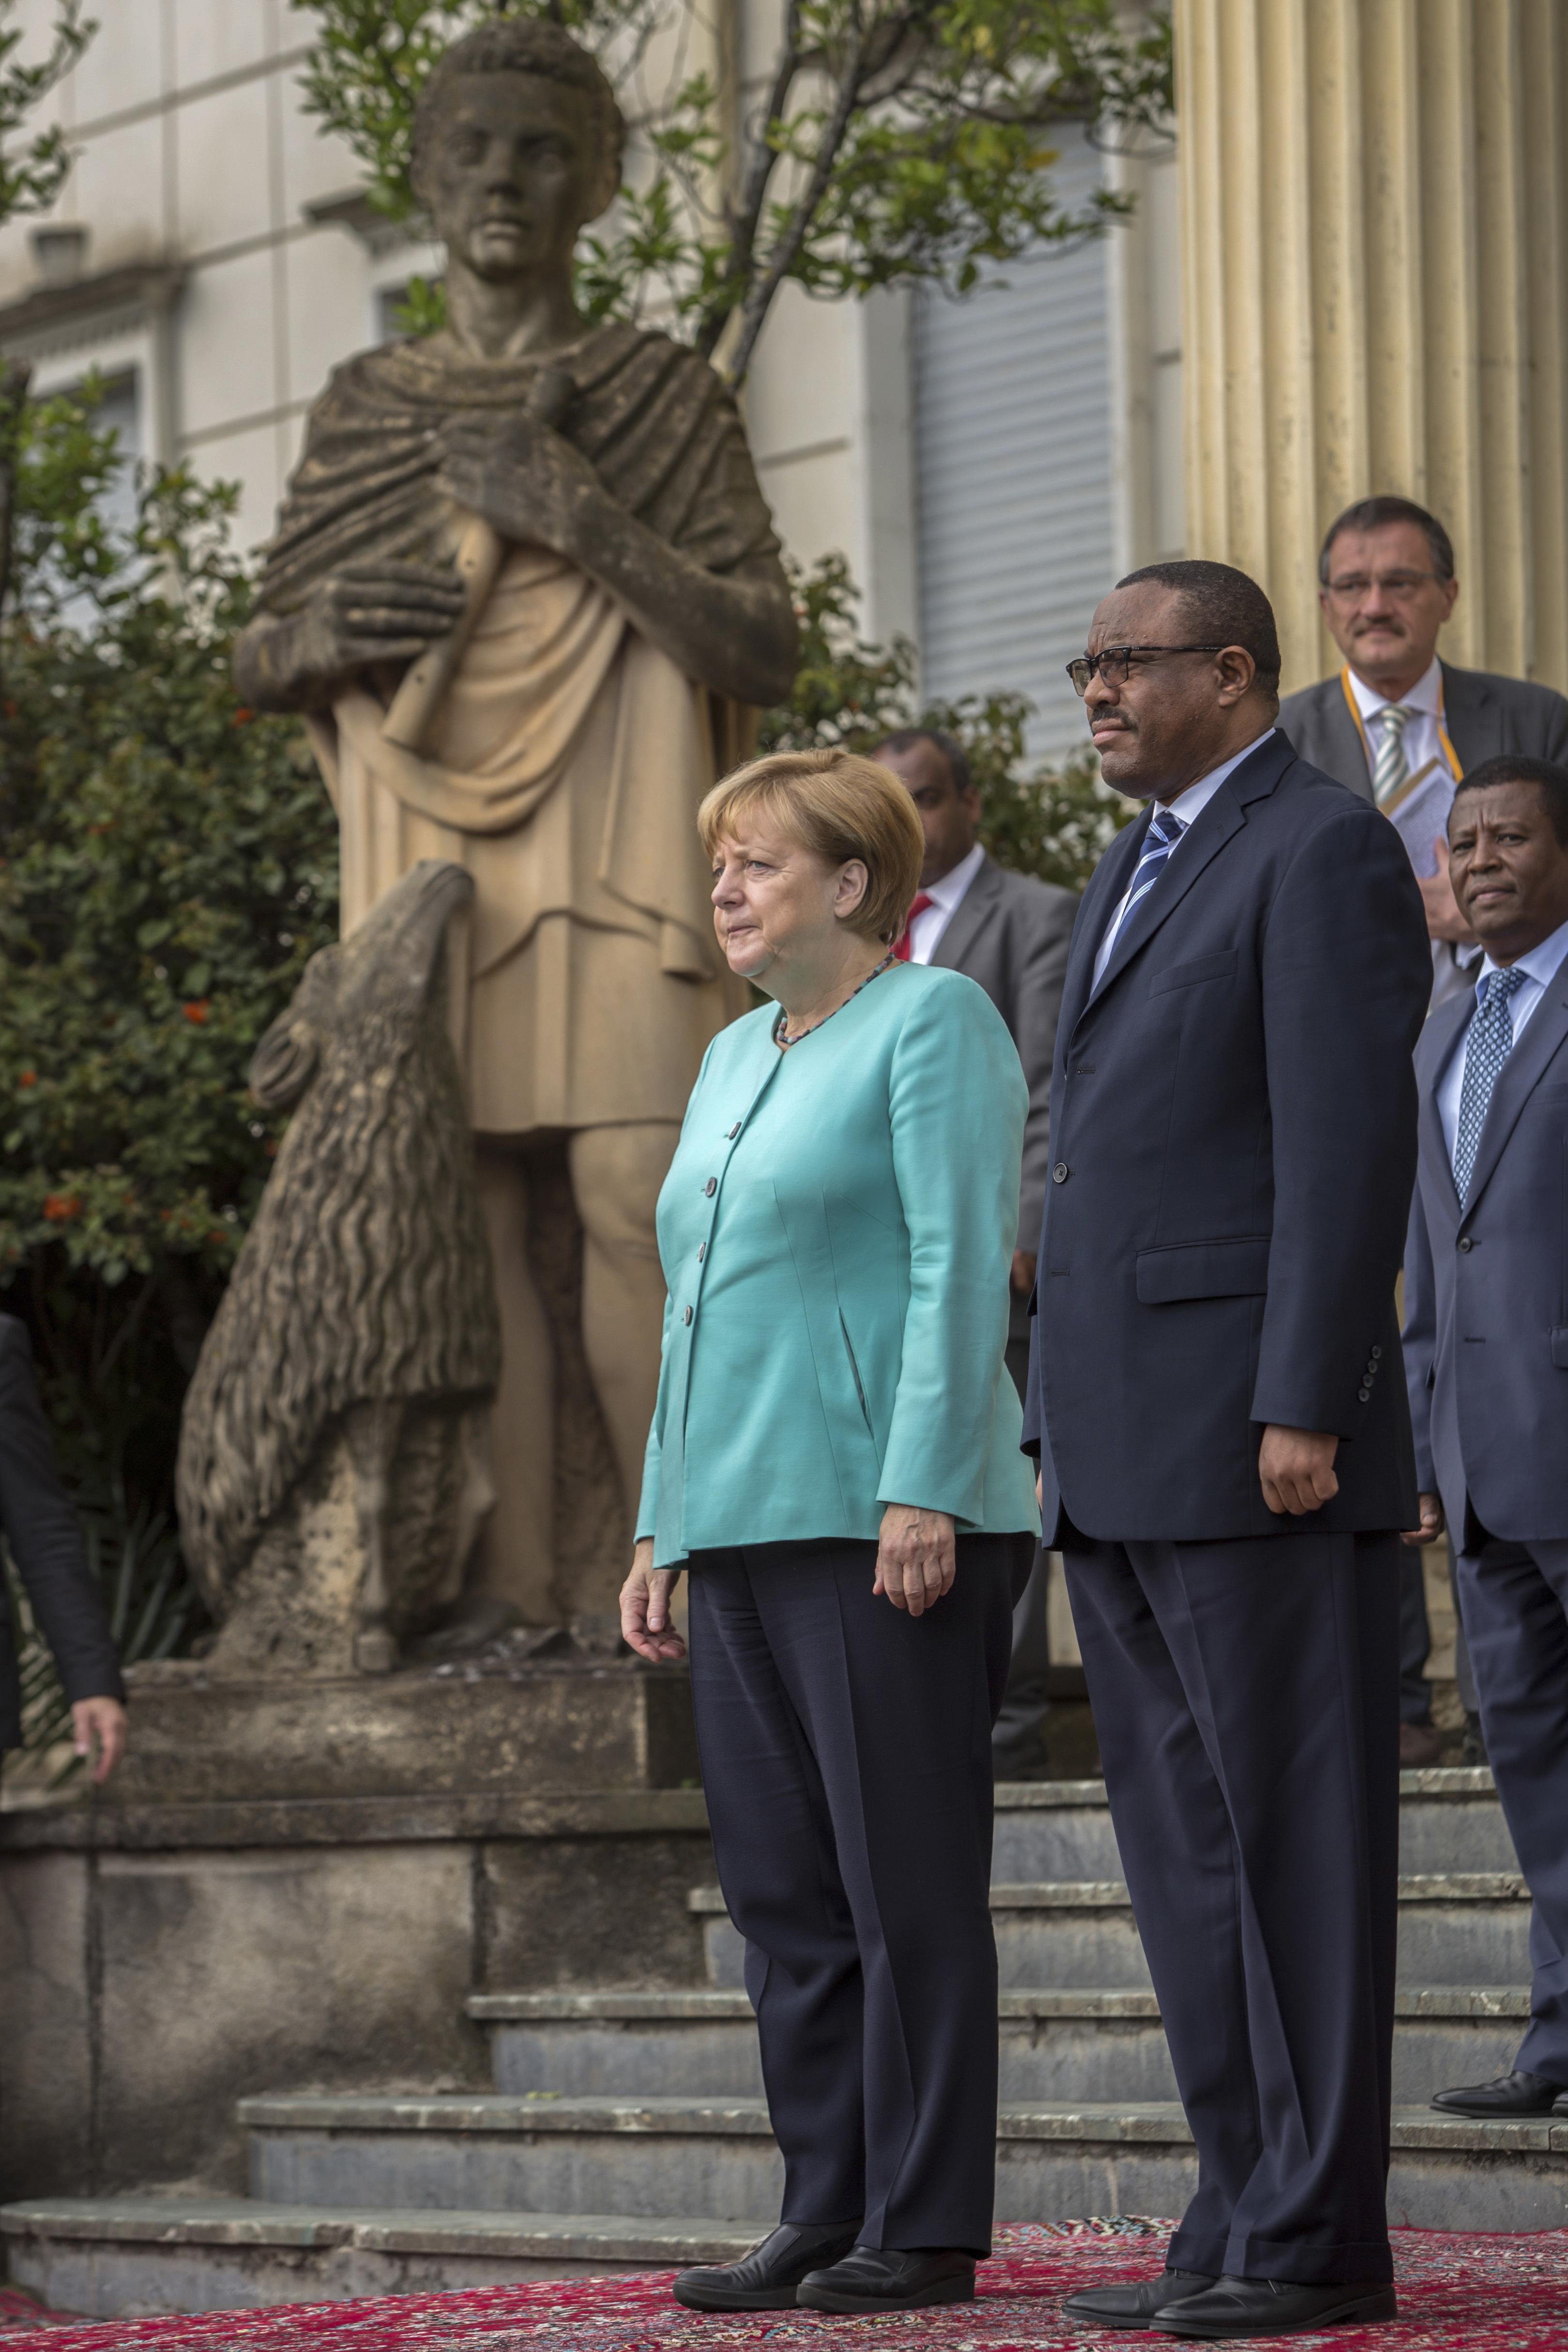 German Chancellor Angela Merkel, center, and Ethiopia's Prime Minister Hailemariam Desalegn.